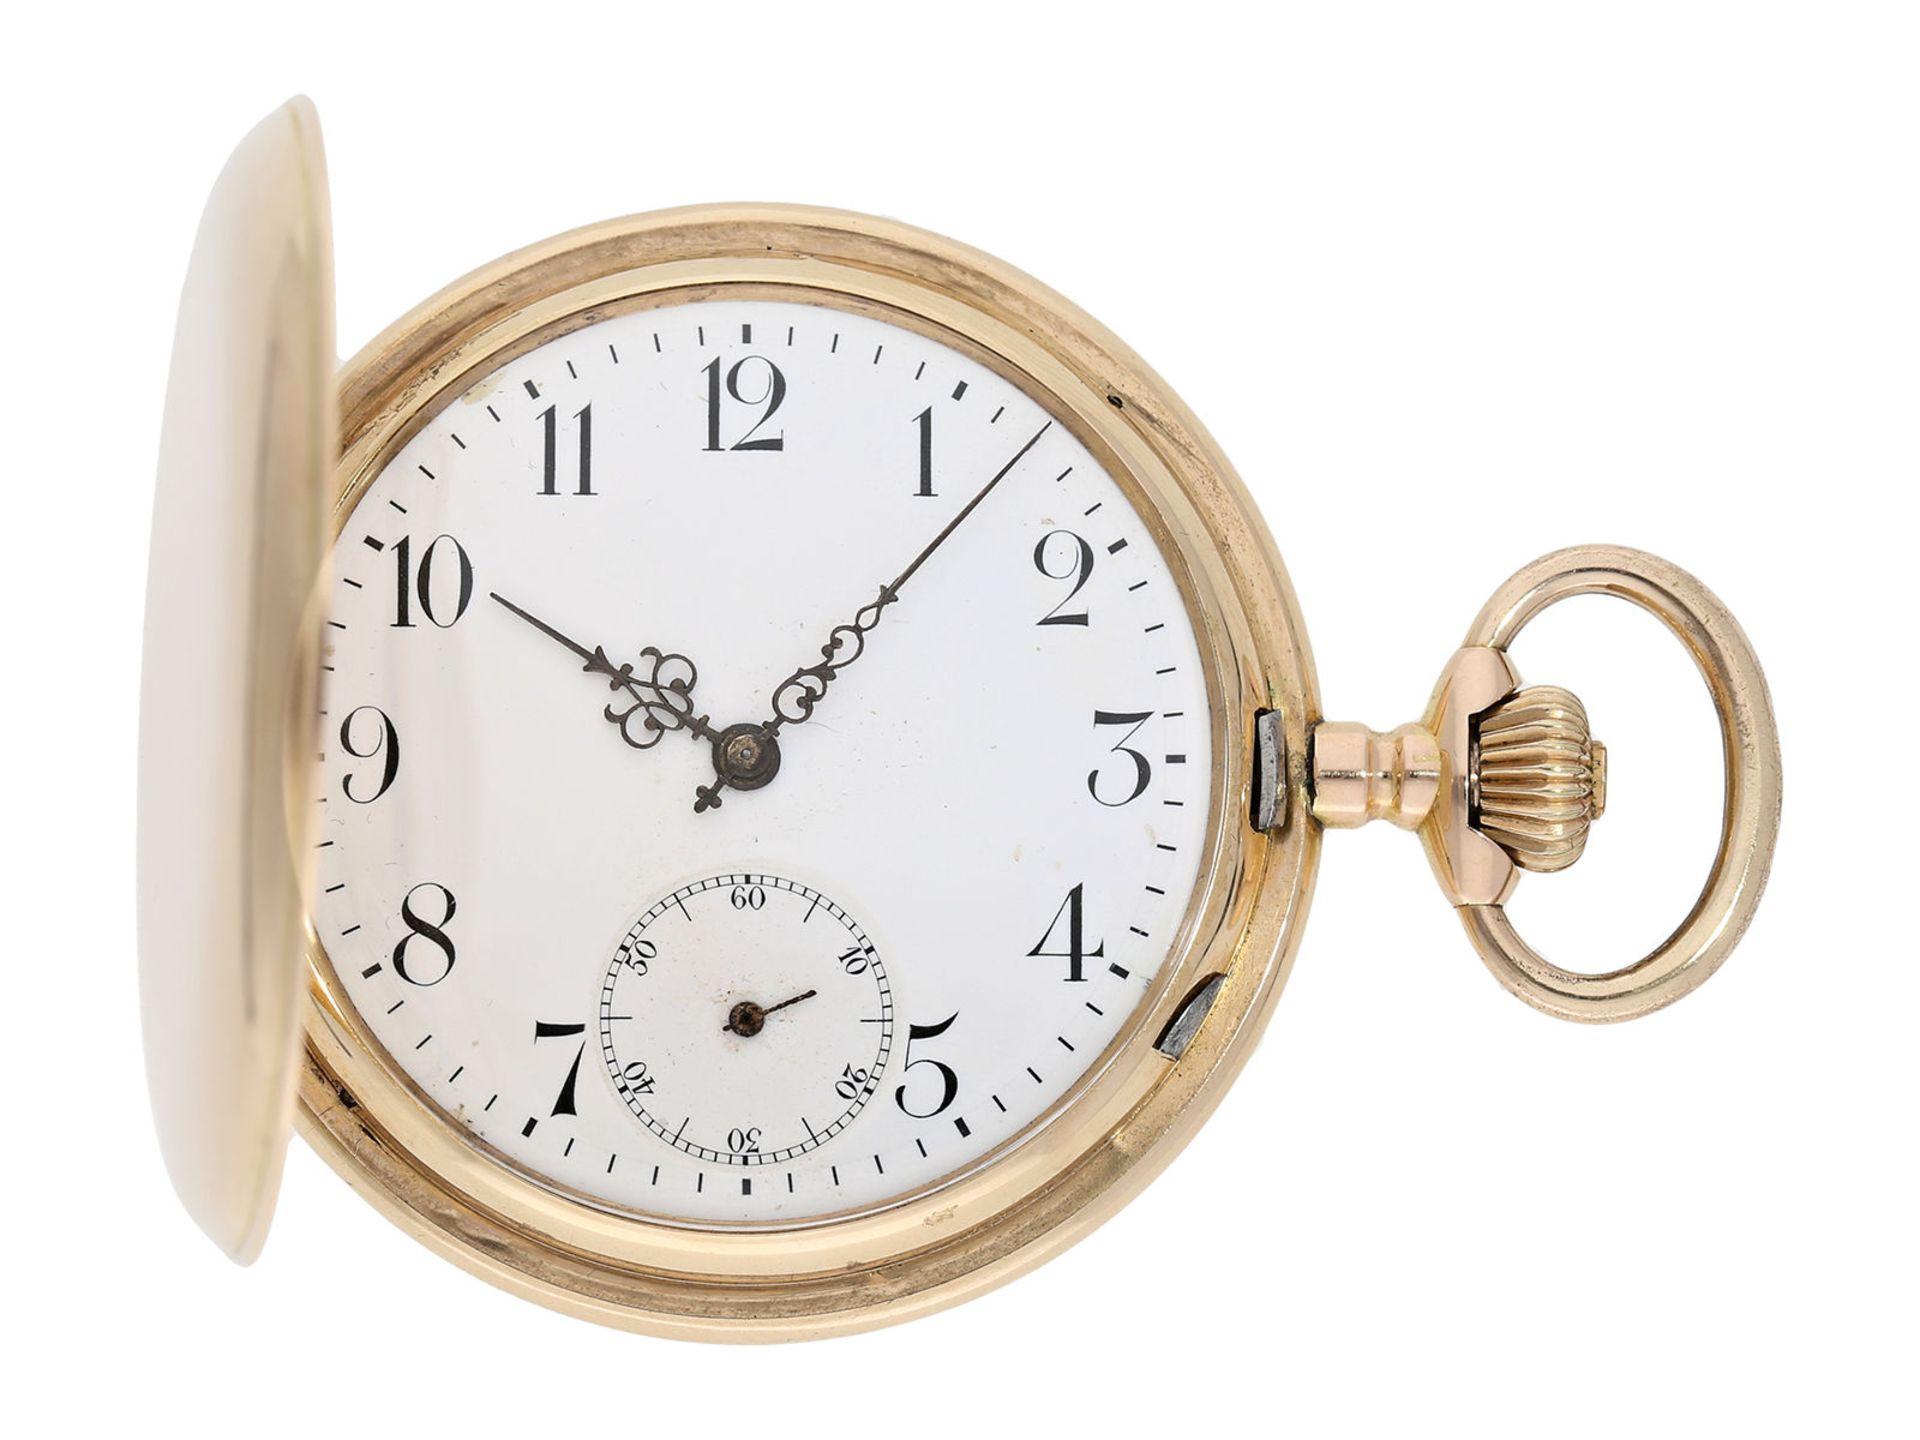 Pocket watch: heavy pink gold hunting case watch, Swiss Ankerchronometer, around 1900, No.